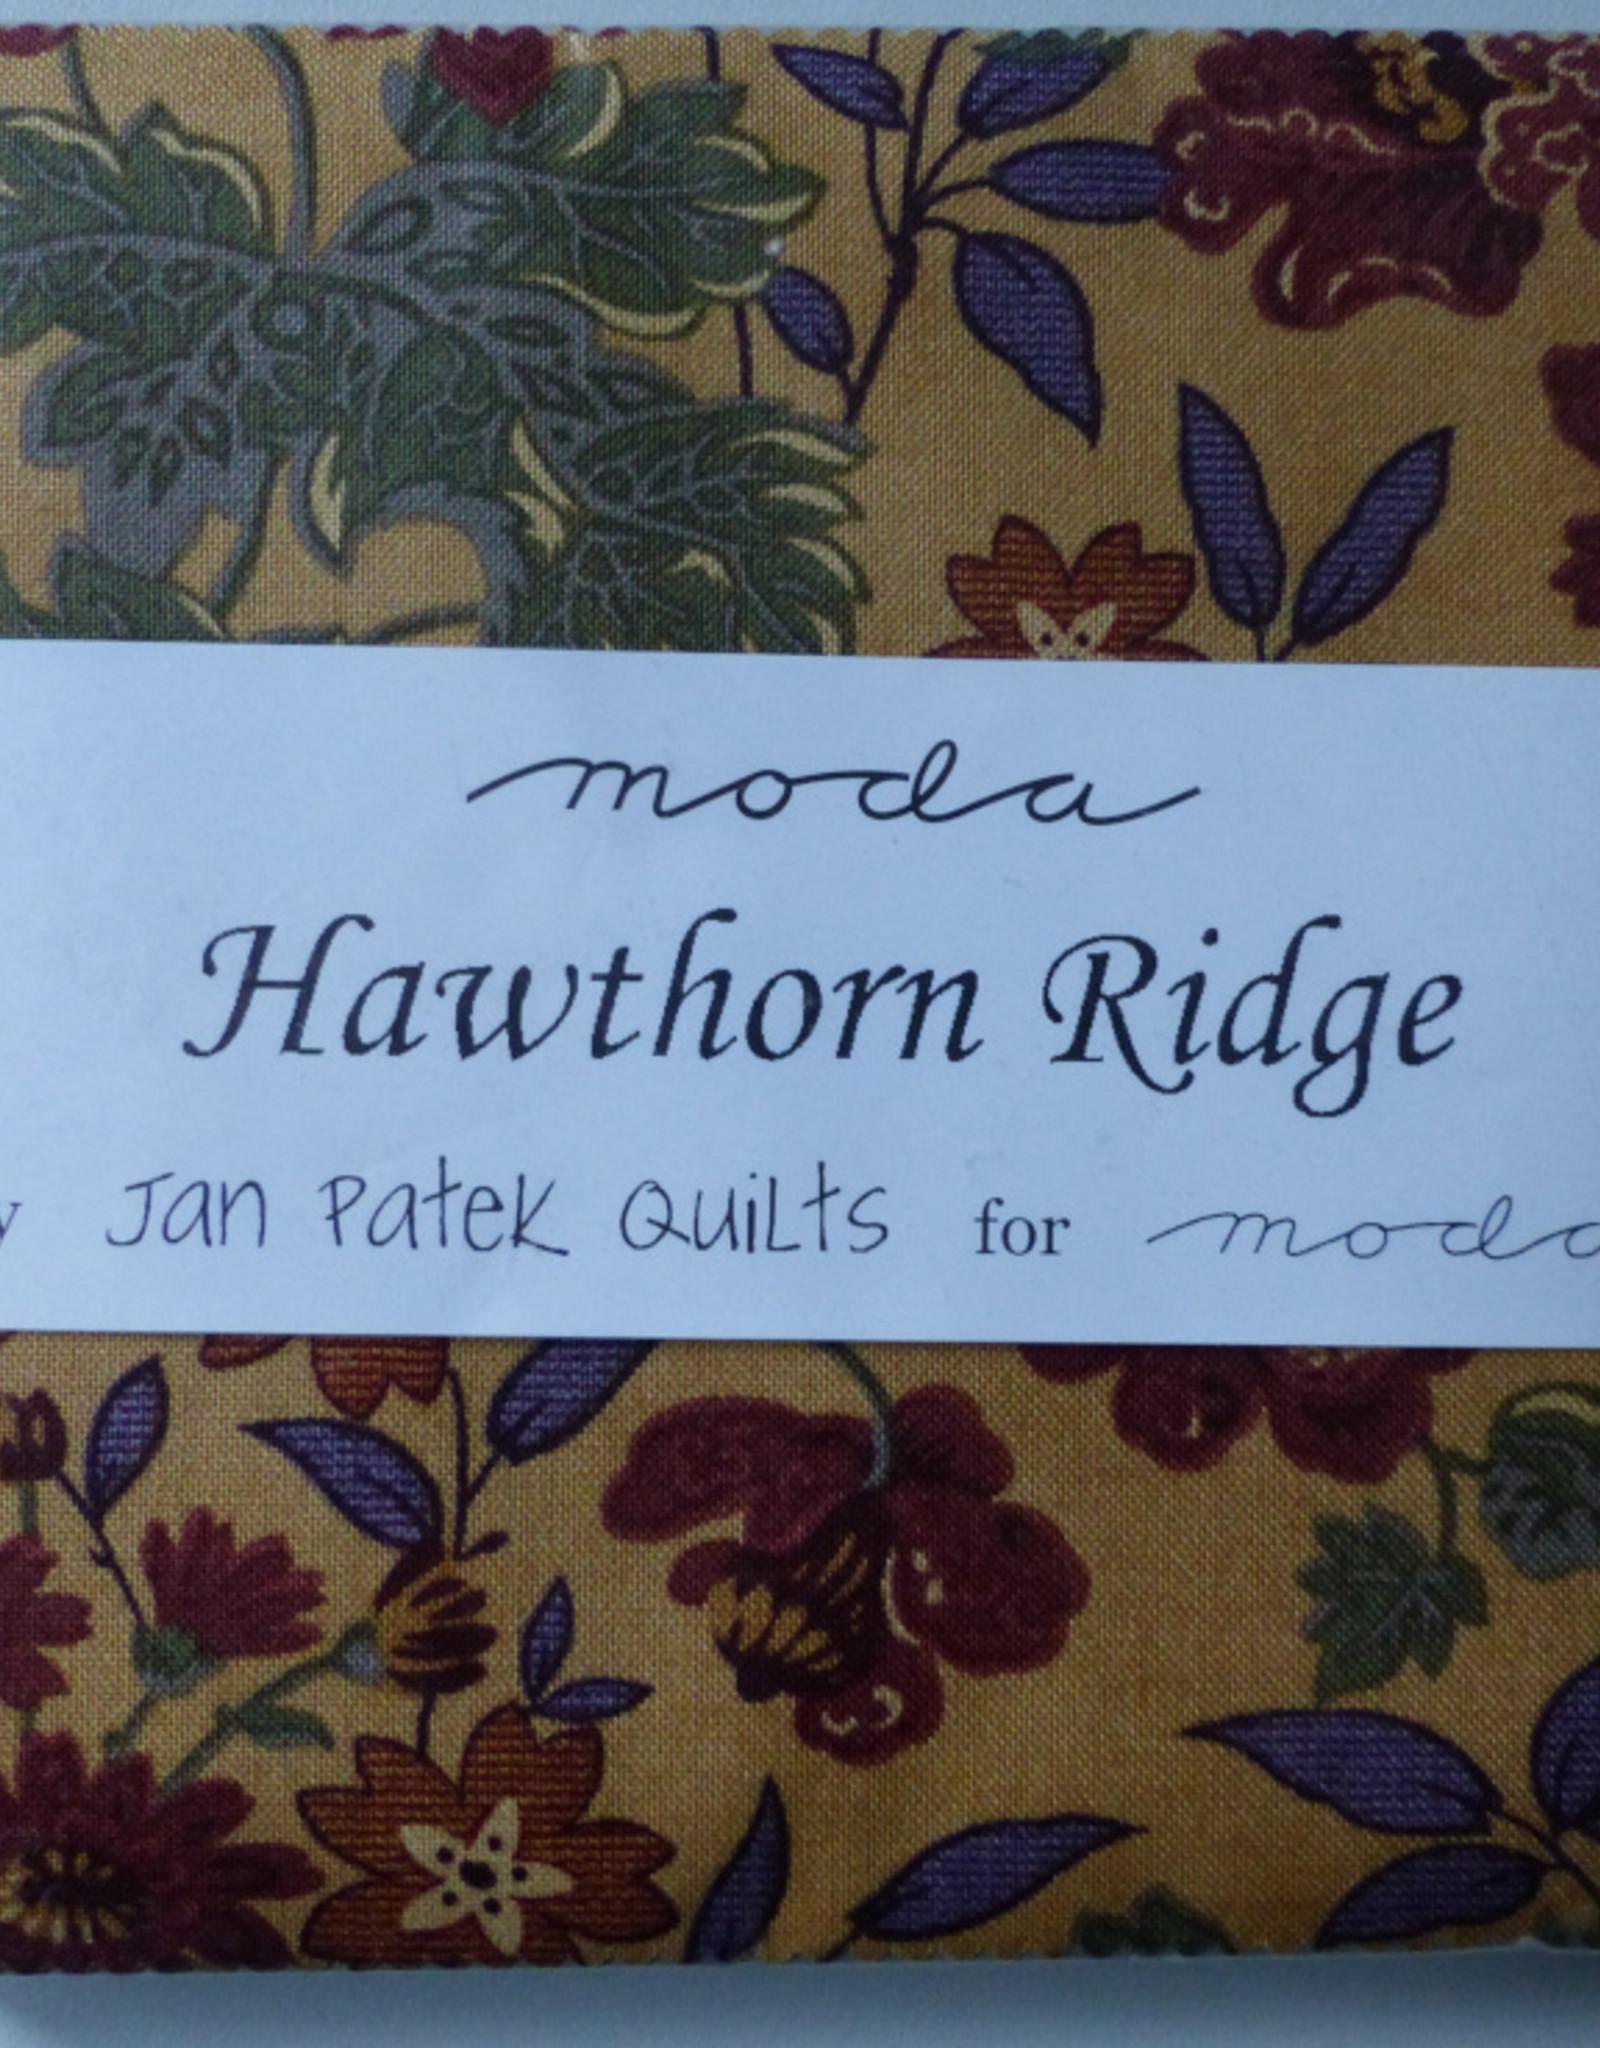 moda Charm Pack Hawthorn Ridge